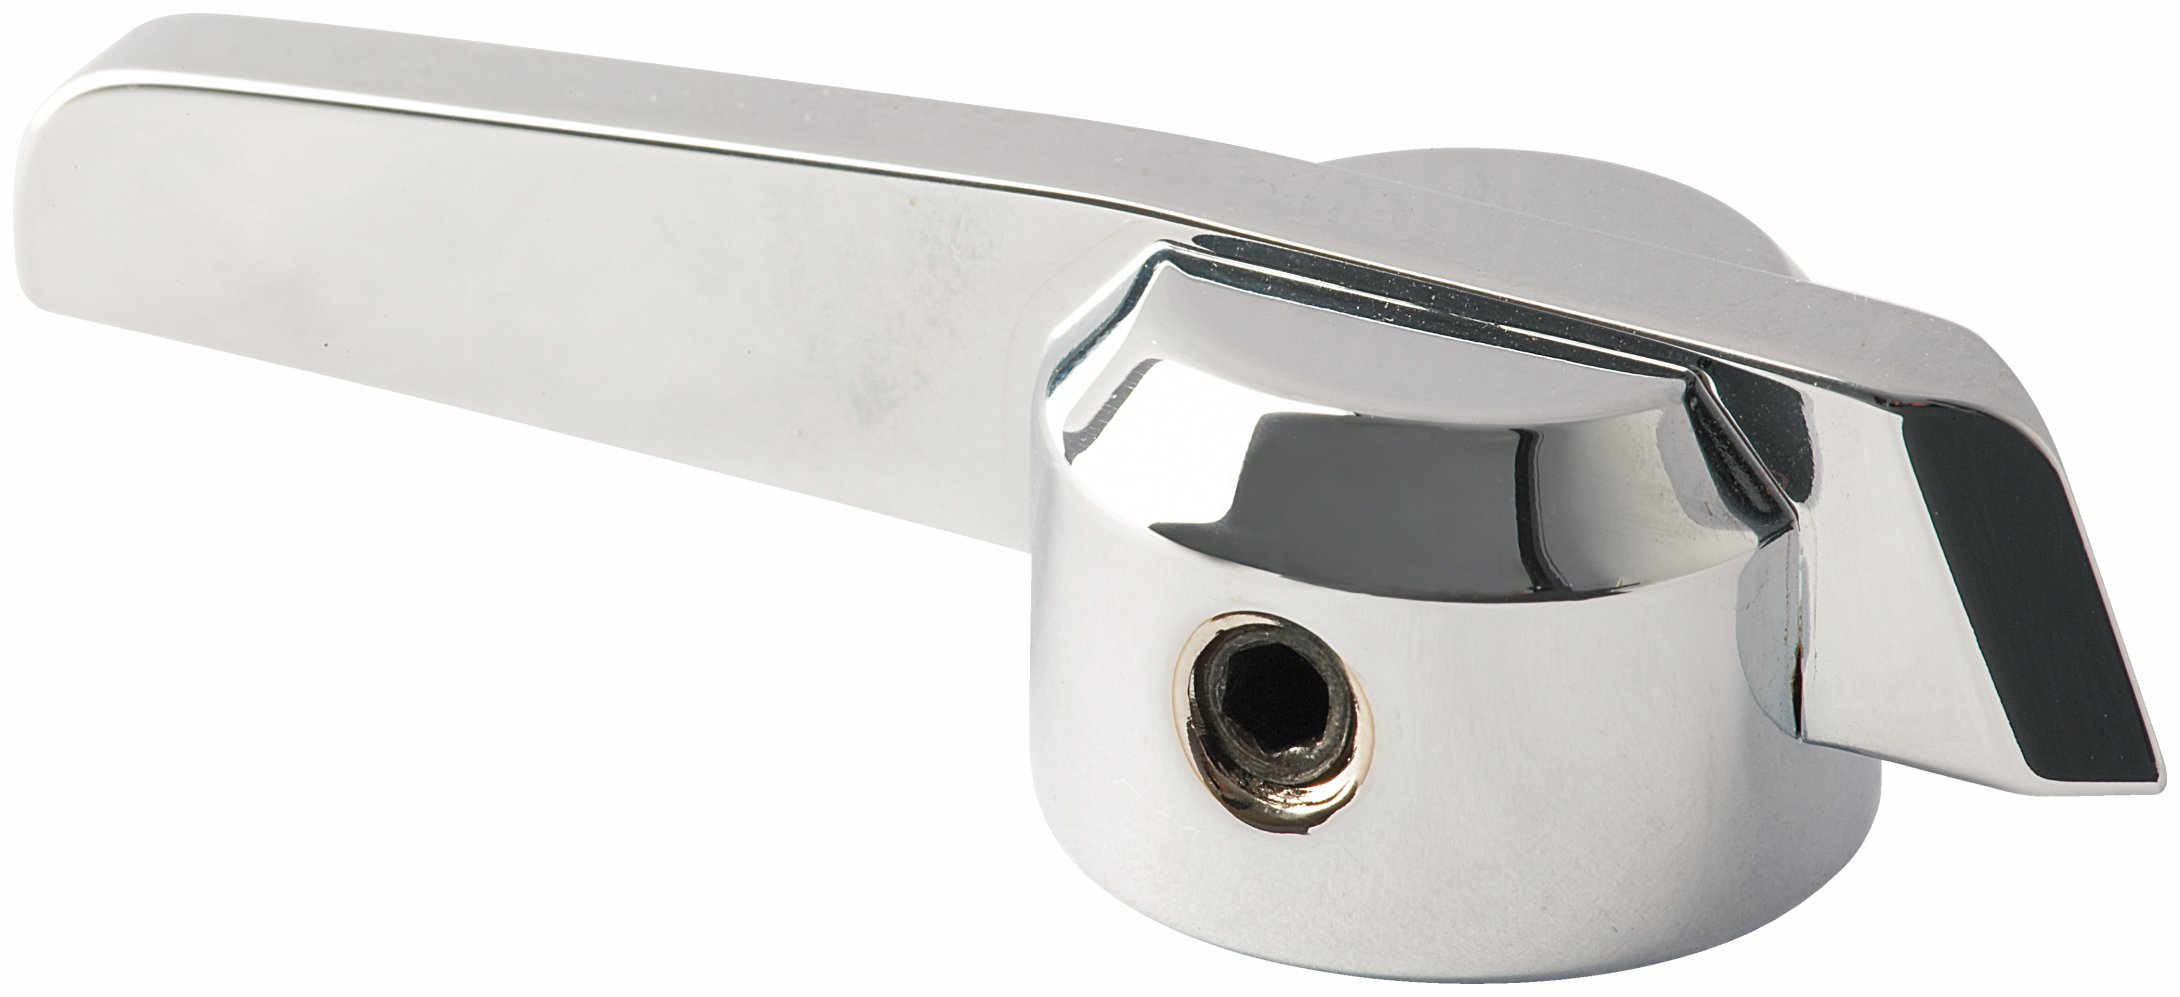 Framus Vintage Parts - Switch Knob with Sharp Edge, Chrome